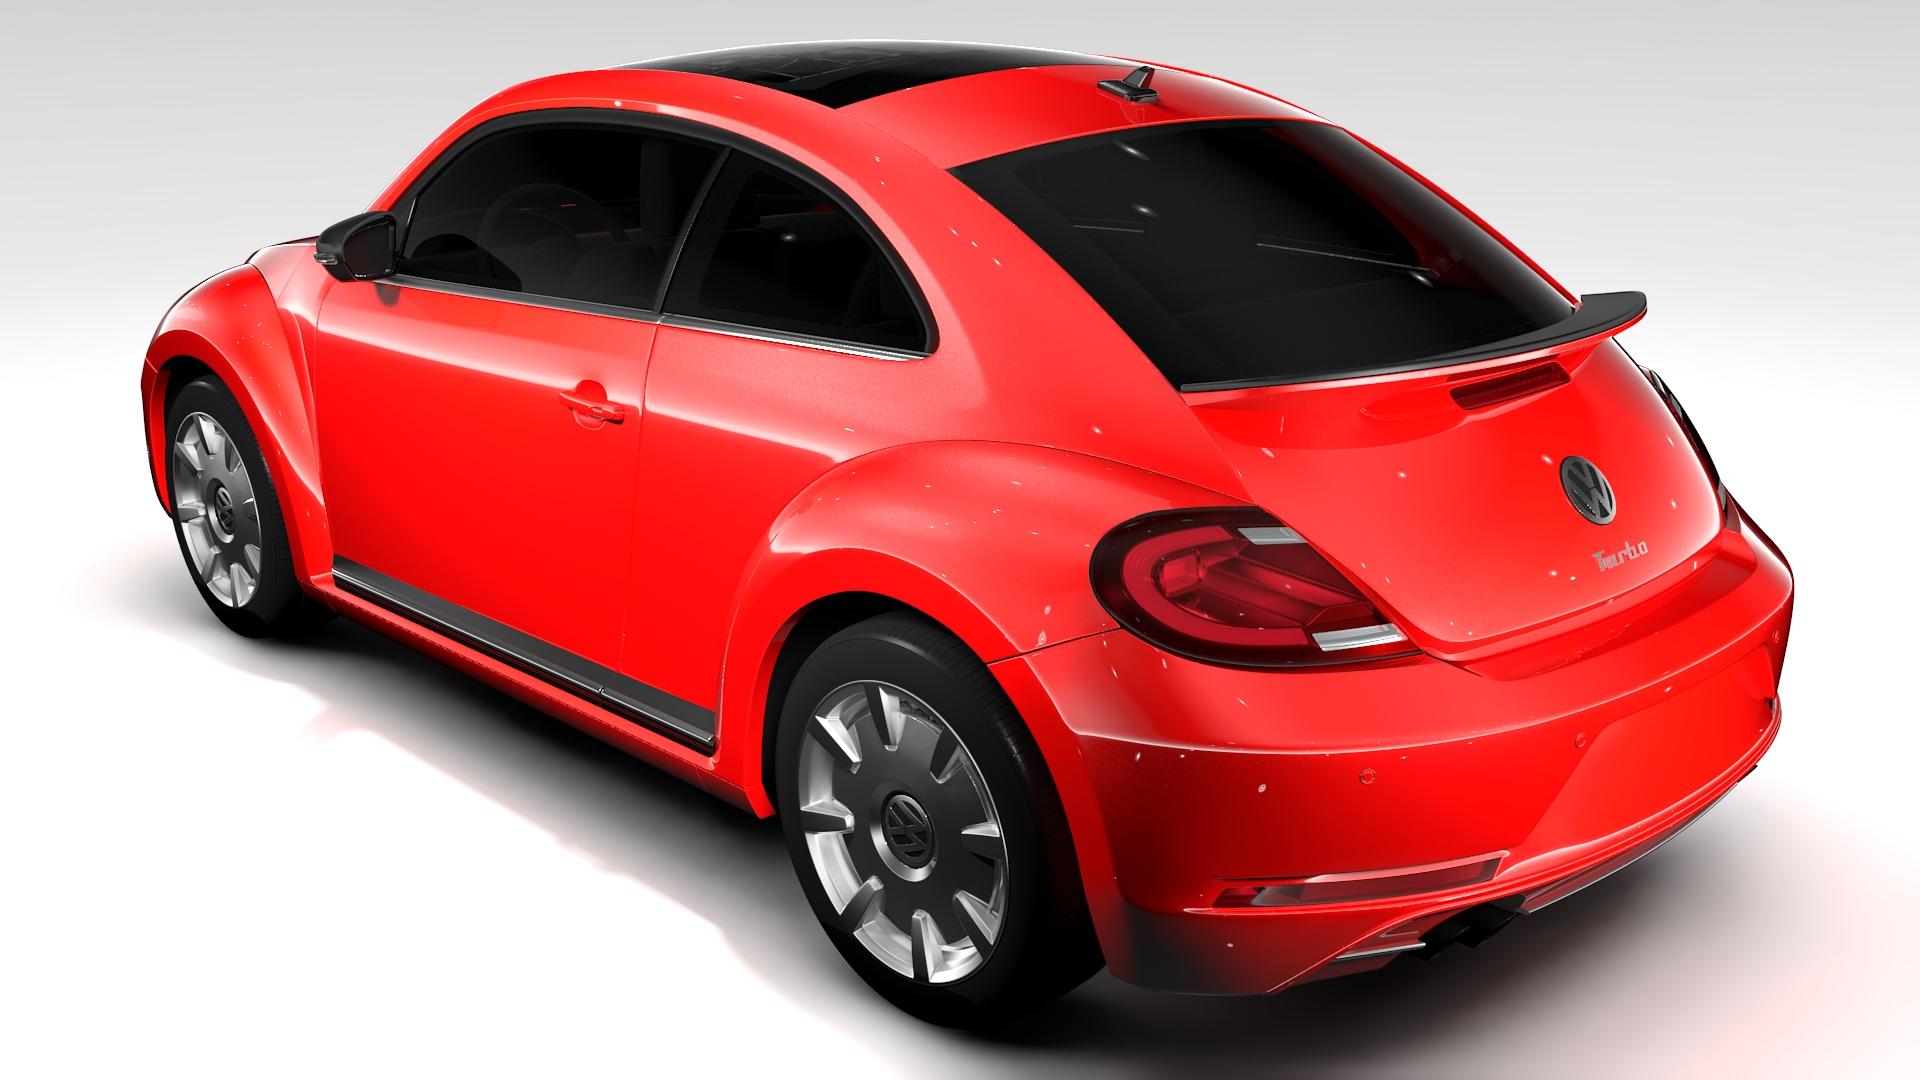 vw beetle turbo 2017 3d model 3ds max fbx c4d lwo ma mb hrc xsi obj 221663